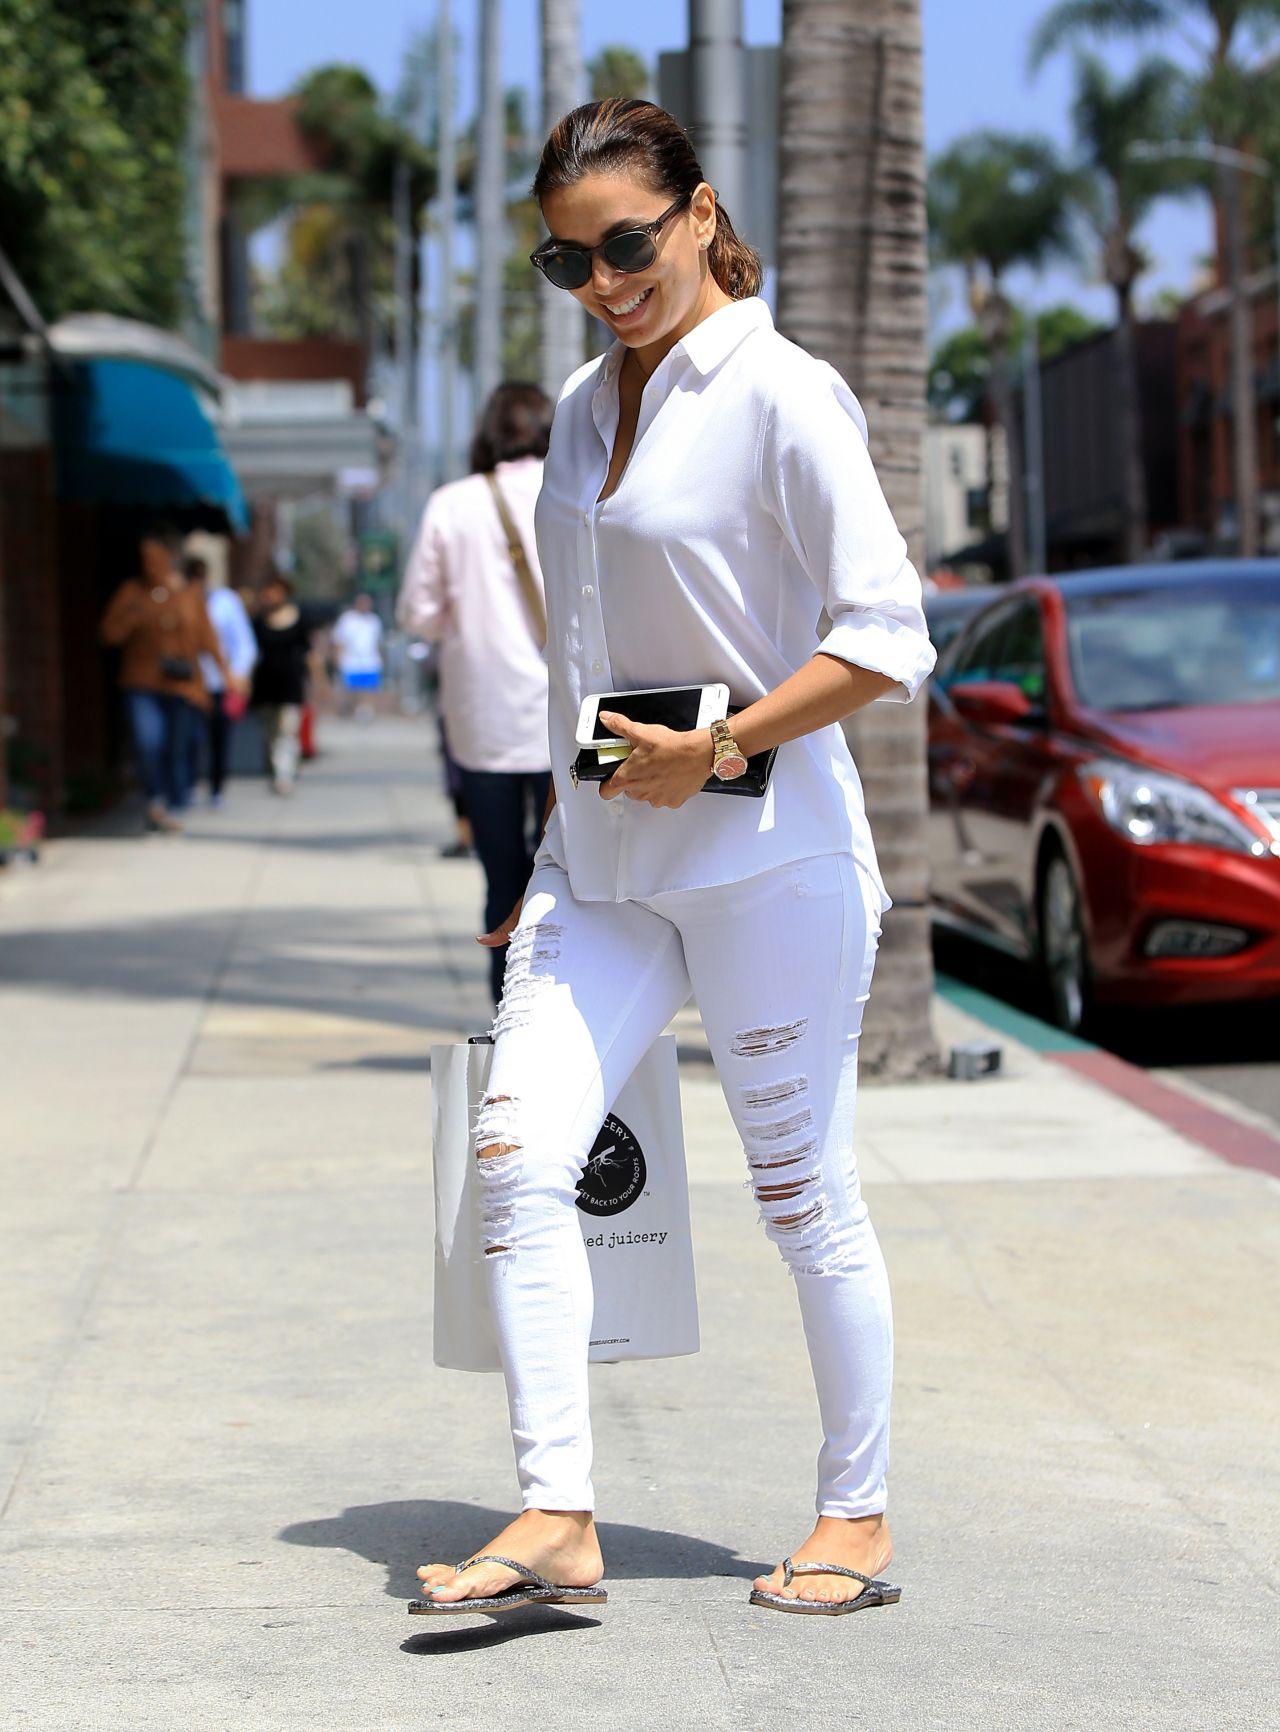 Beliebt Longoria Inspiring Street Style - Shopping in LA 7/6/2016 XU36